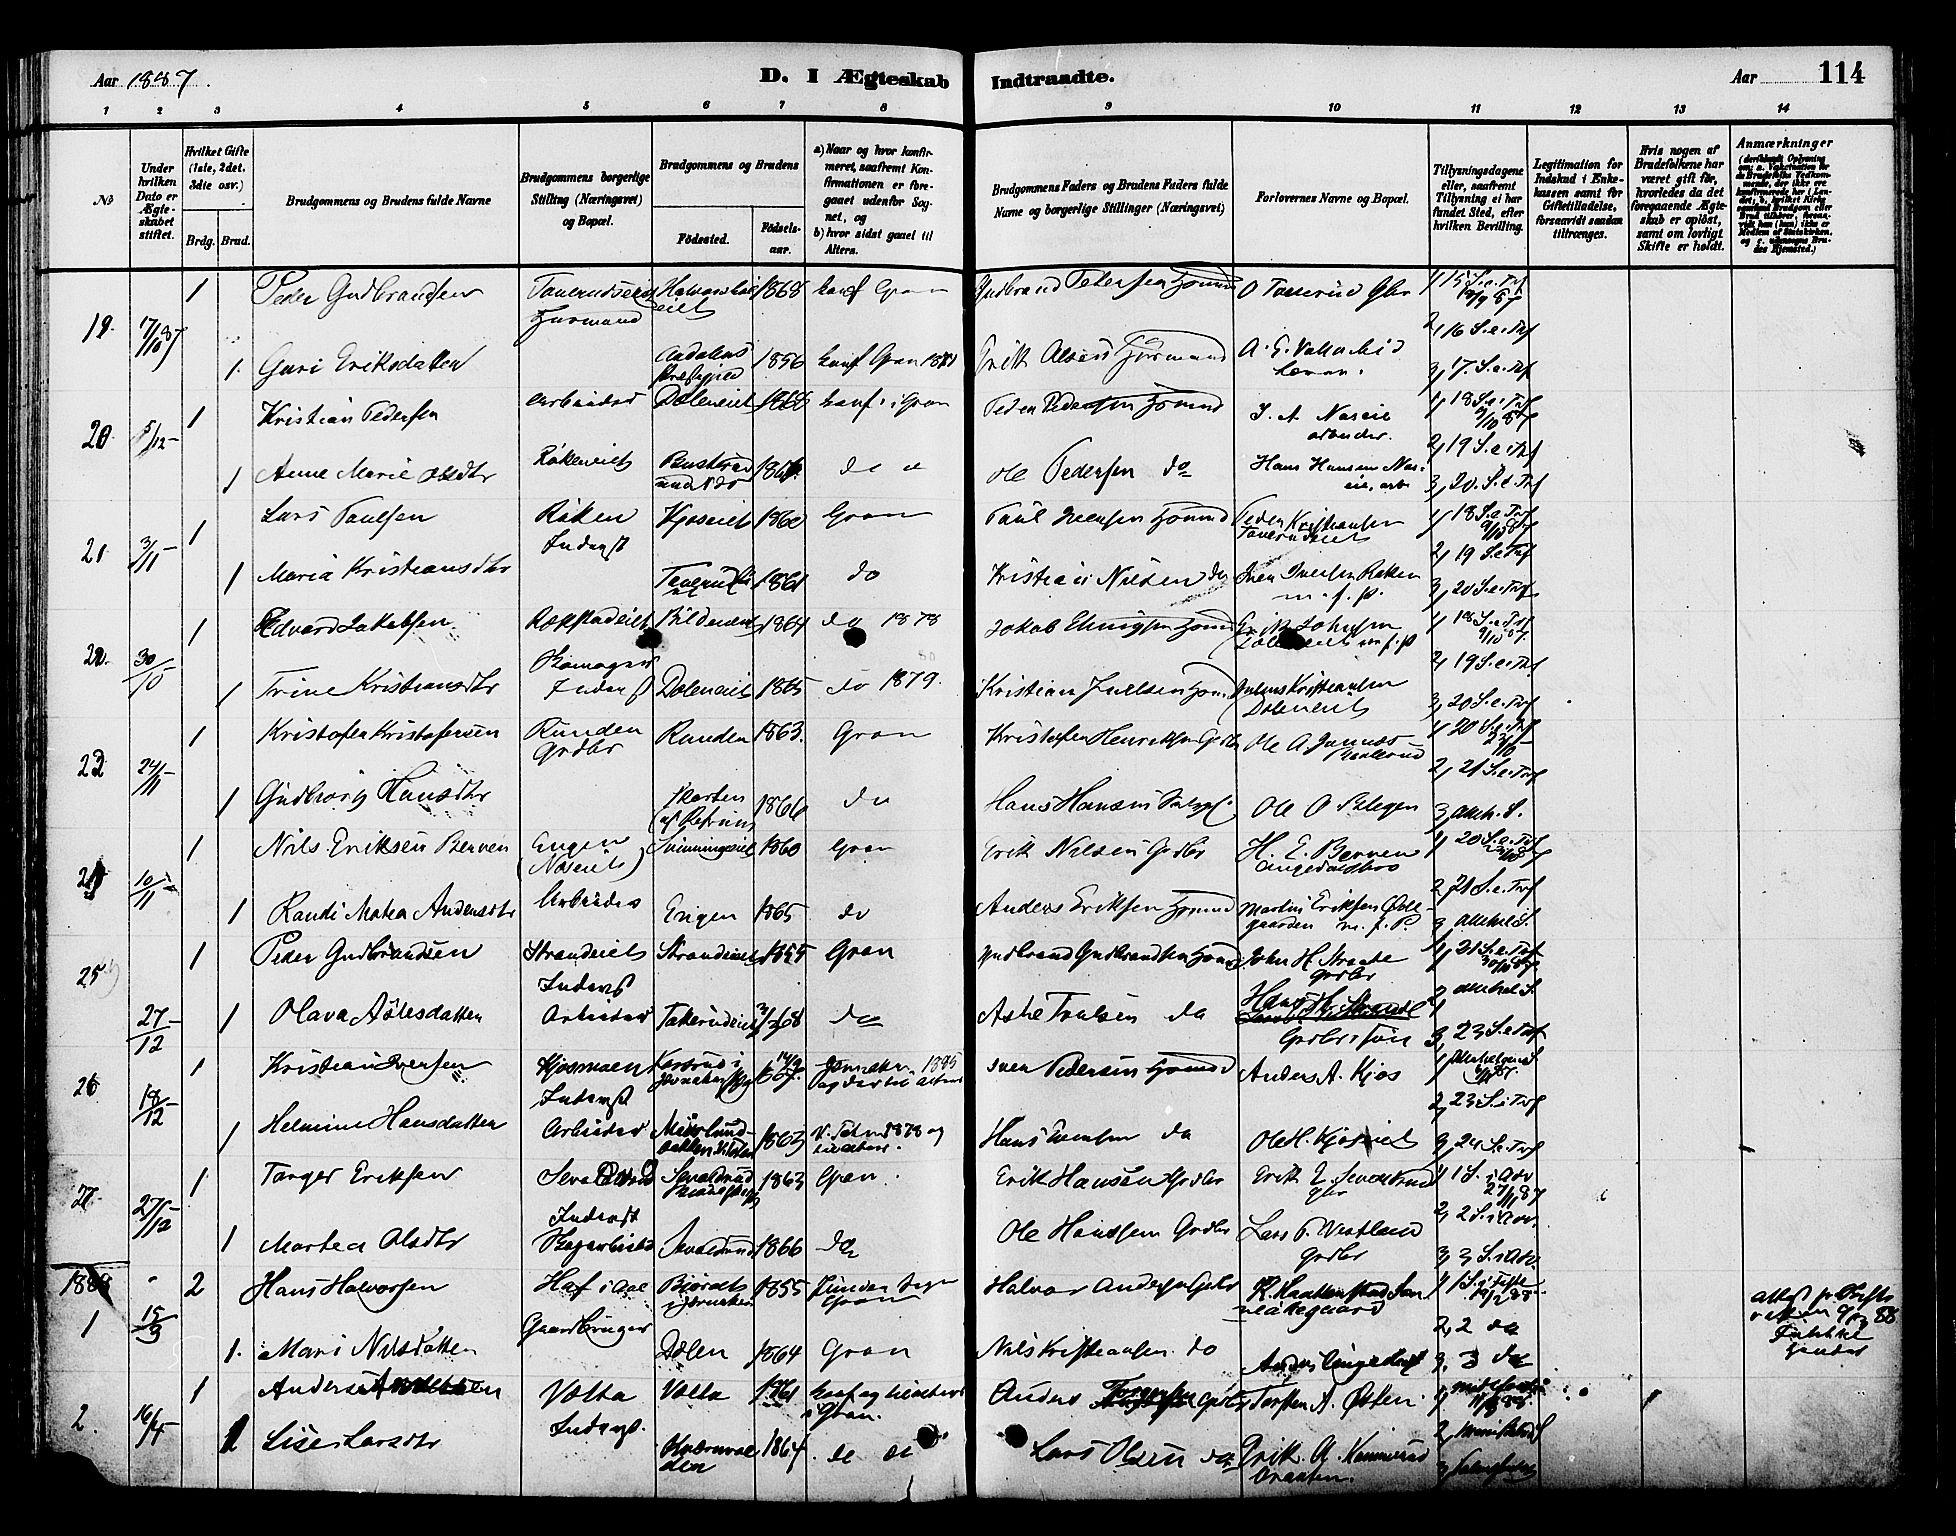 SAH, Gran prestekontor, Ministerialbok nr. 15, 1880-1888, s. 114